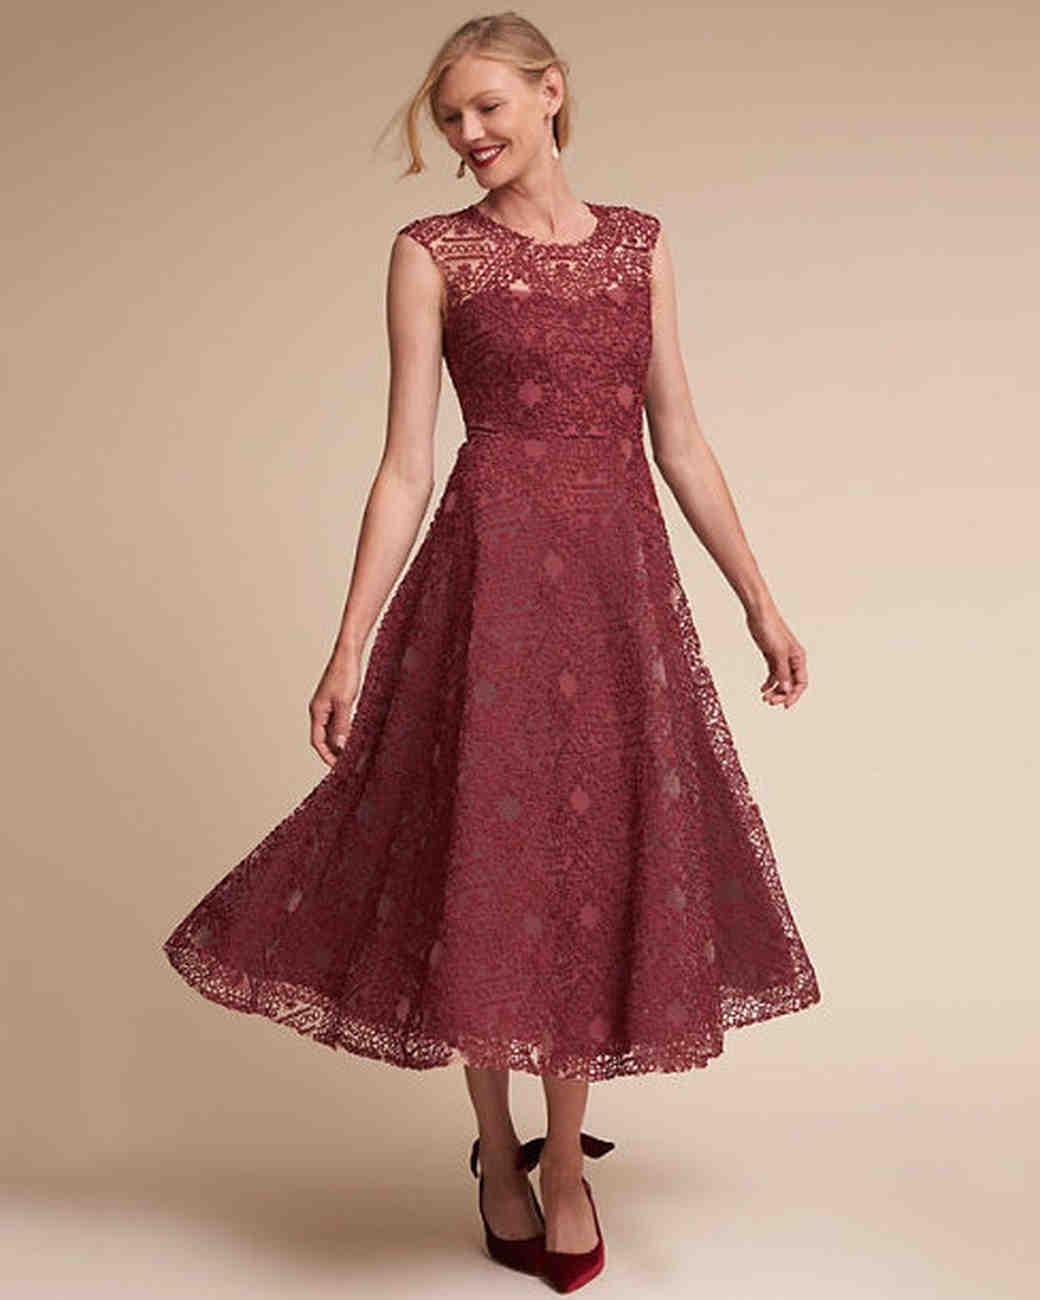 24 Burgundy Mother-of-the-Bride Dresses | Martha Stewart Weddings